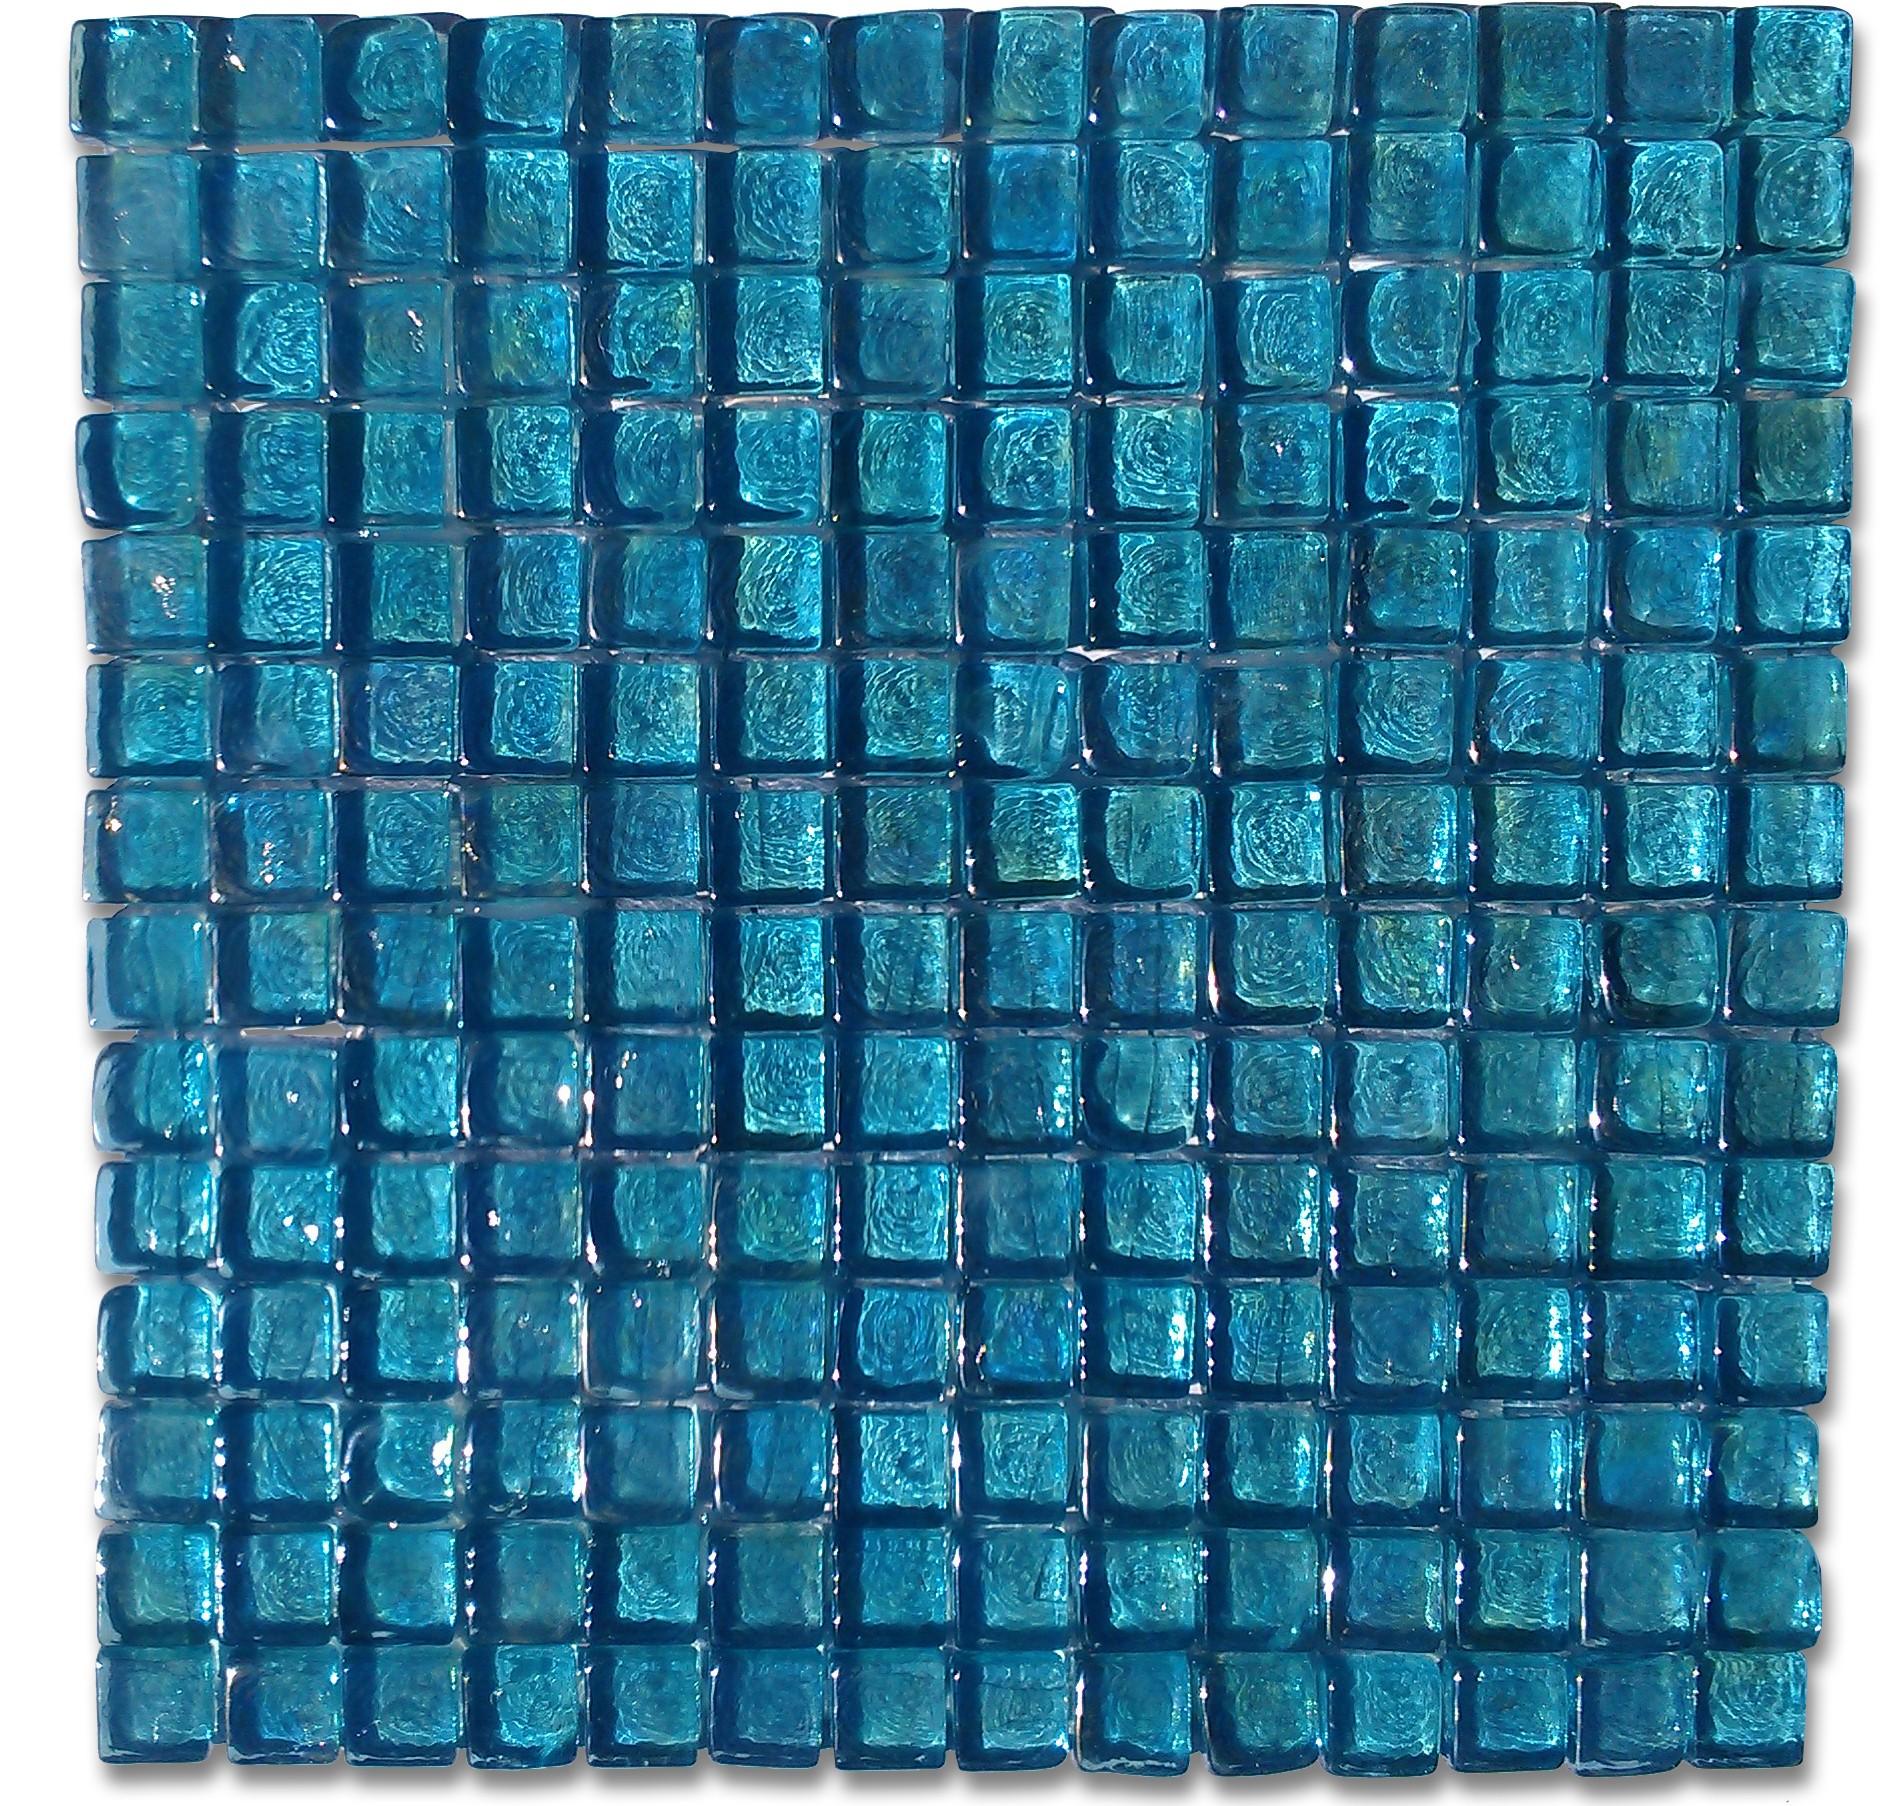 Shop 12 x 12 Murano Azure Square Polished Glass Tile in Iridescent Light Blue at GlassTileStore.com.